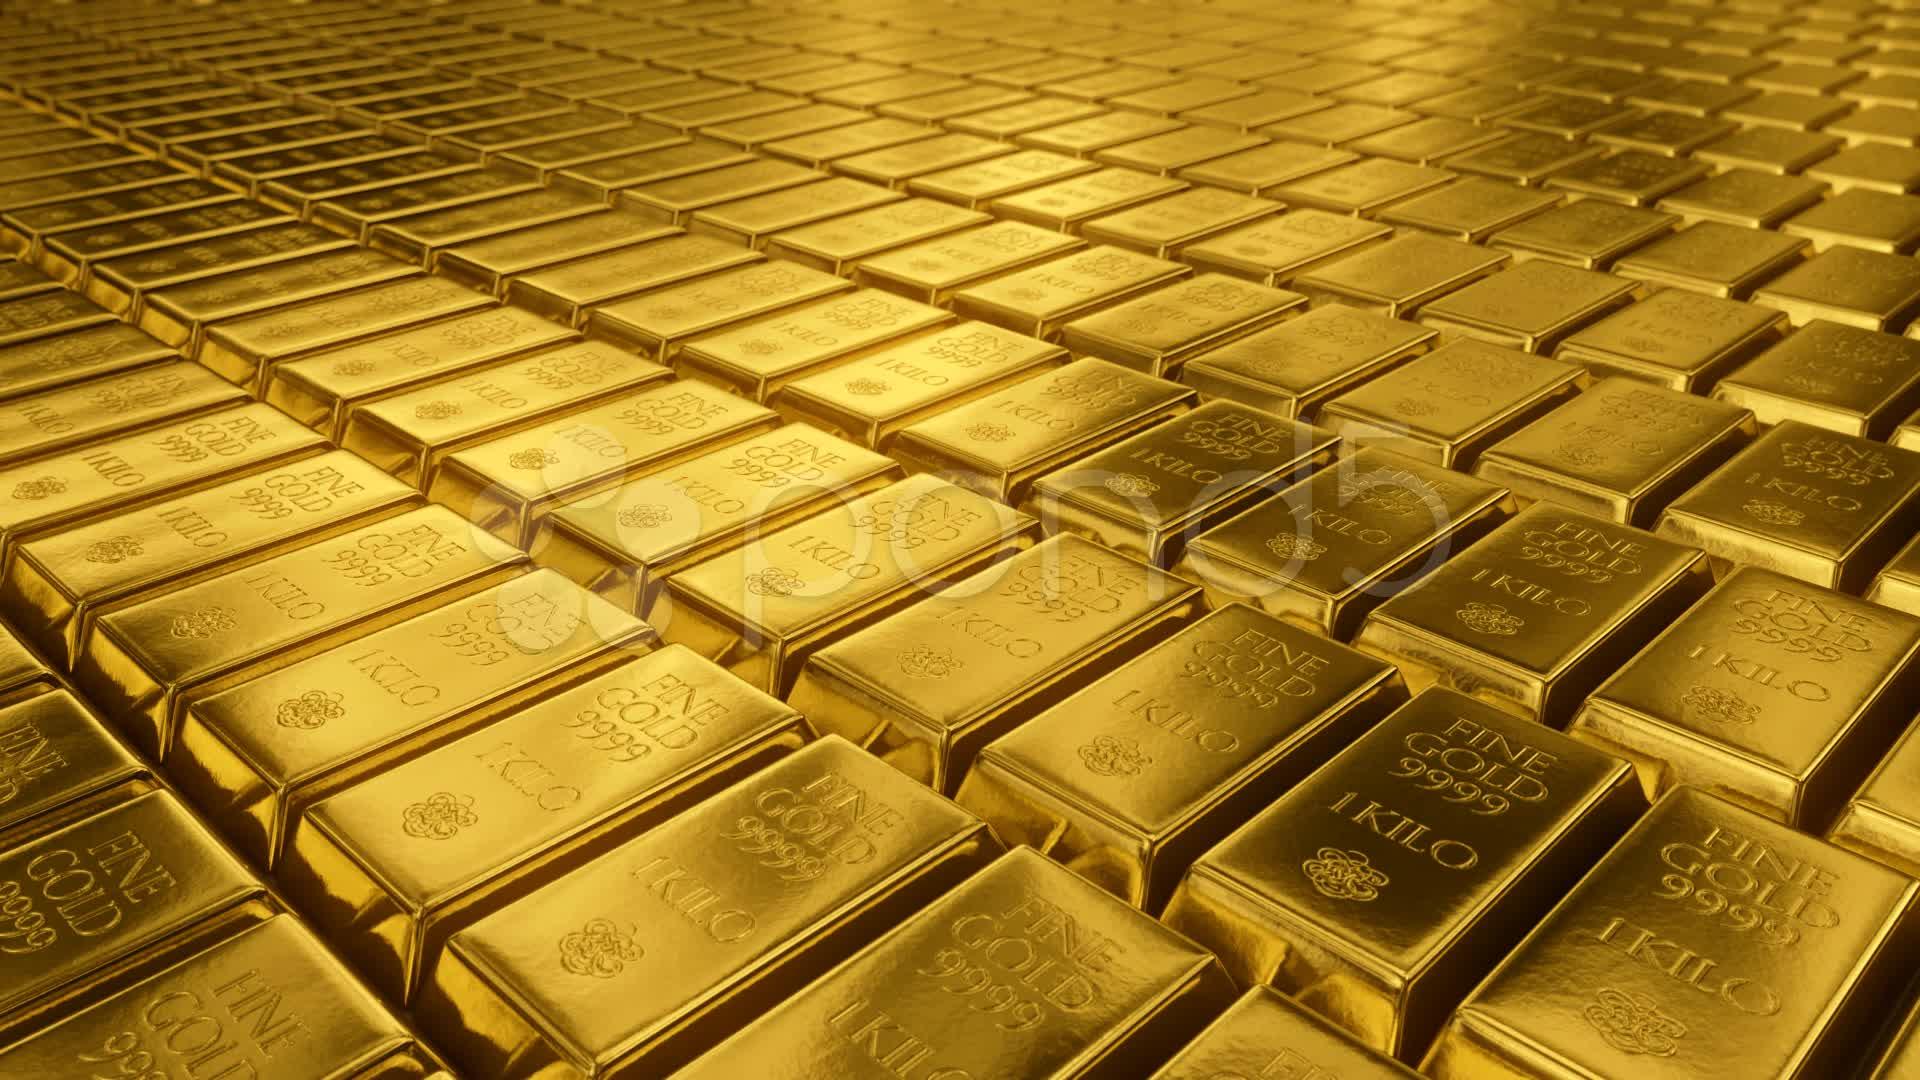 download Gold Bullion Goldbar Treasury Wealth Ingot Luxury 1920x1080